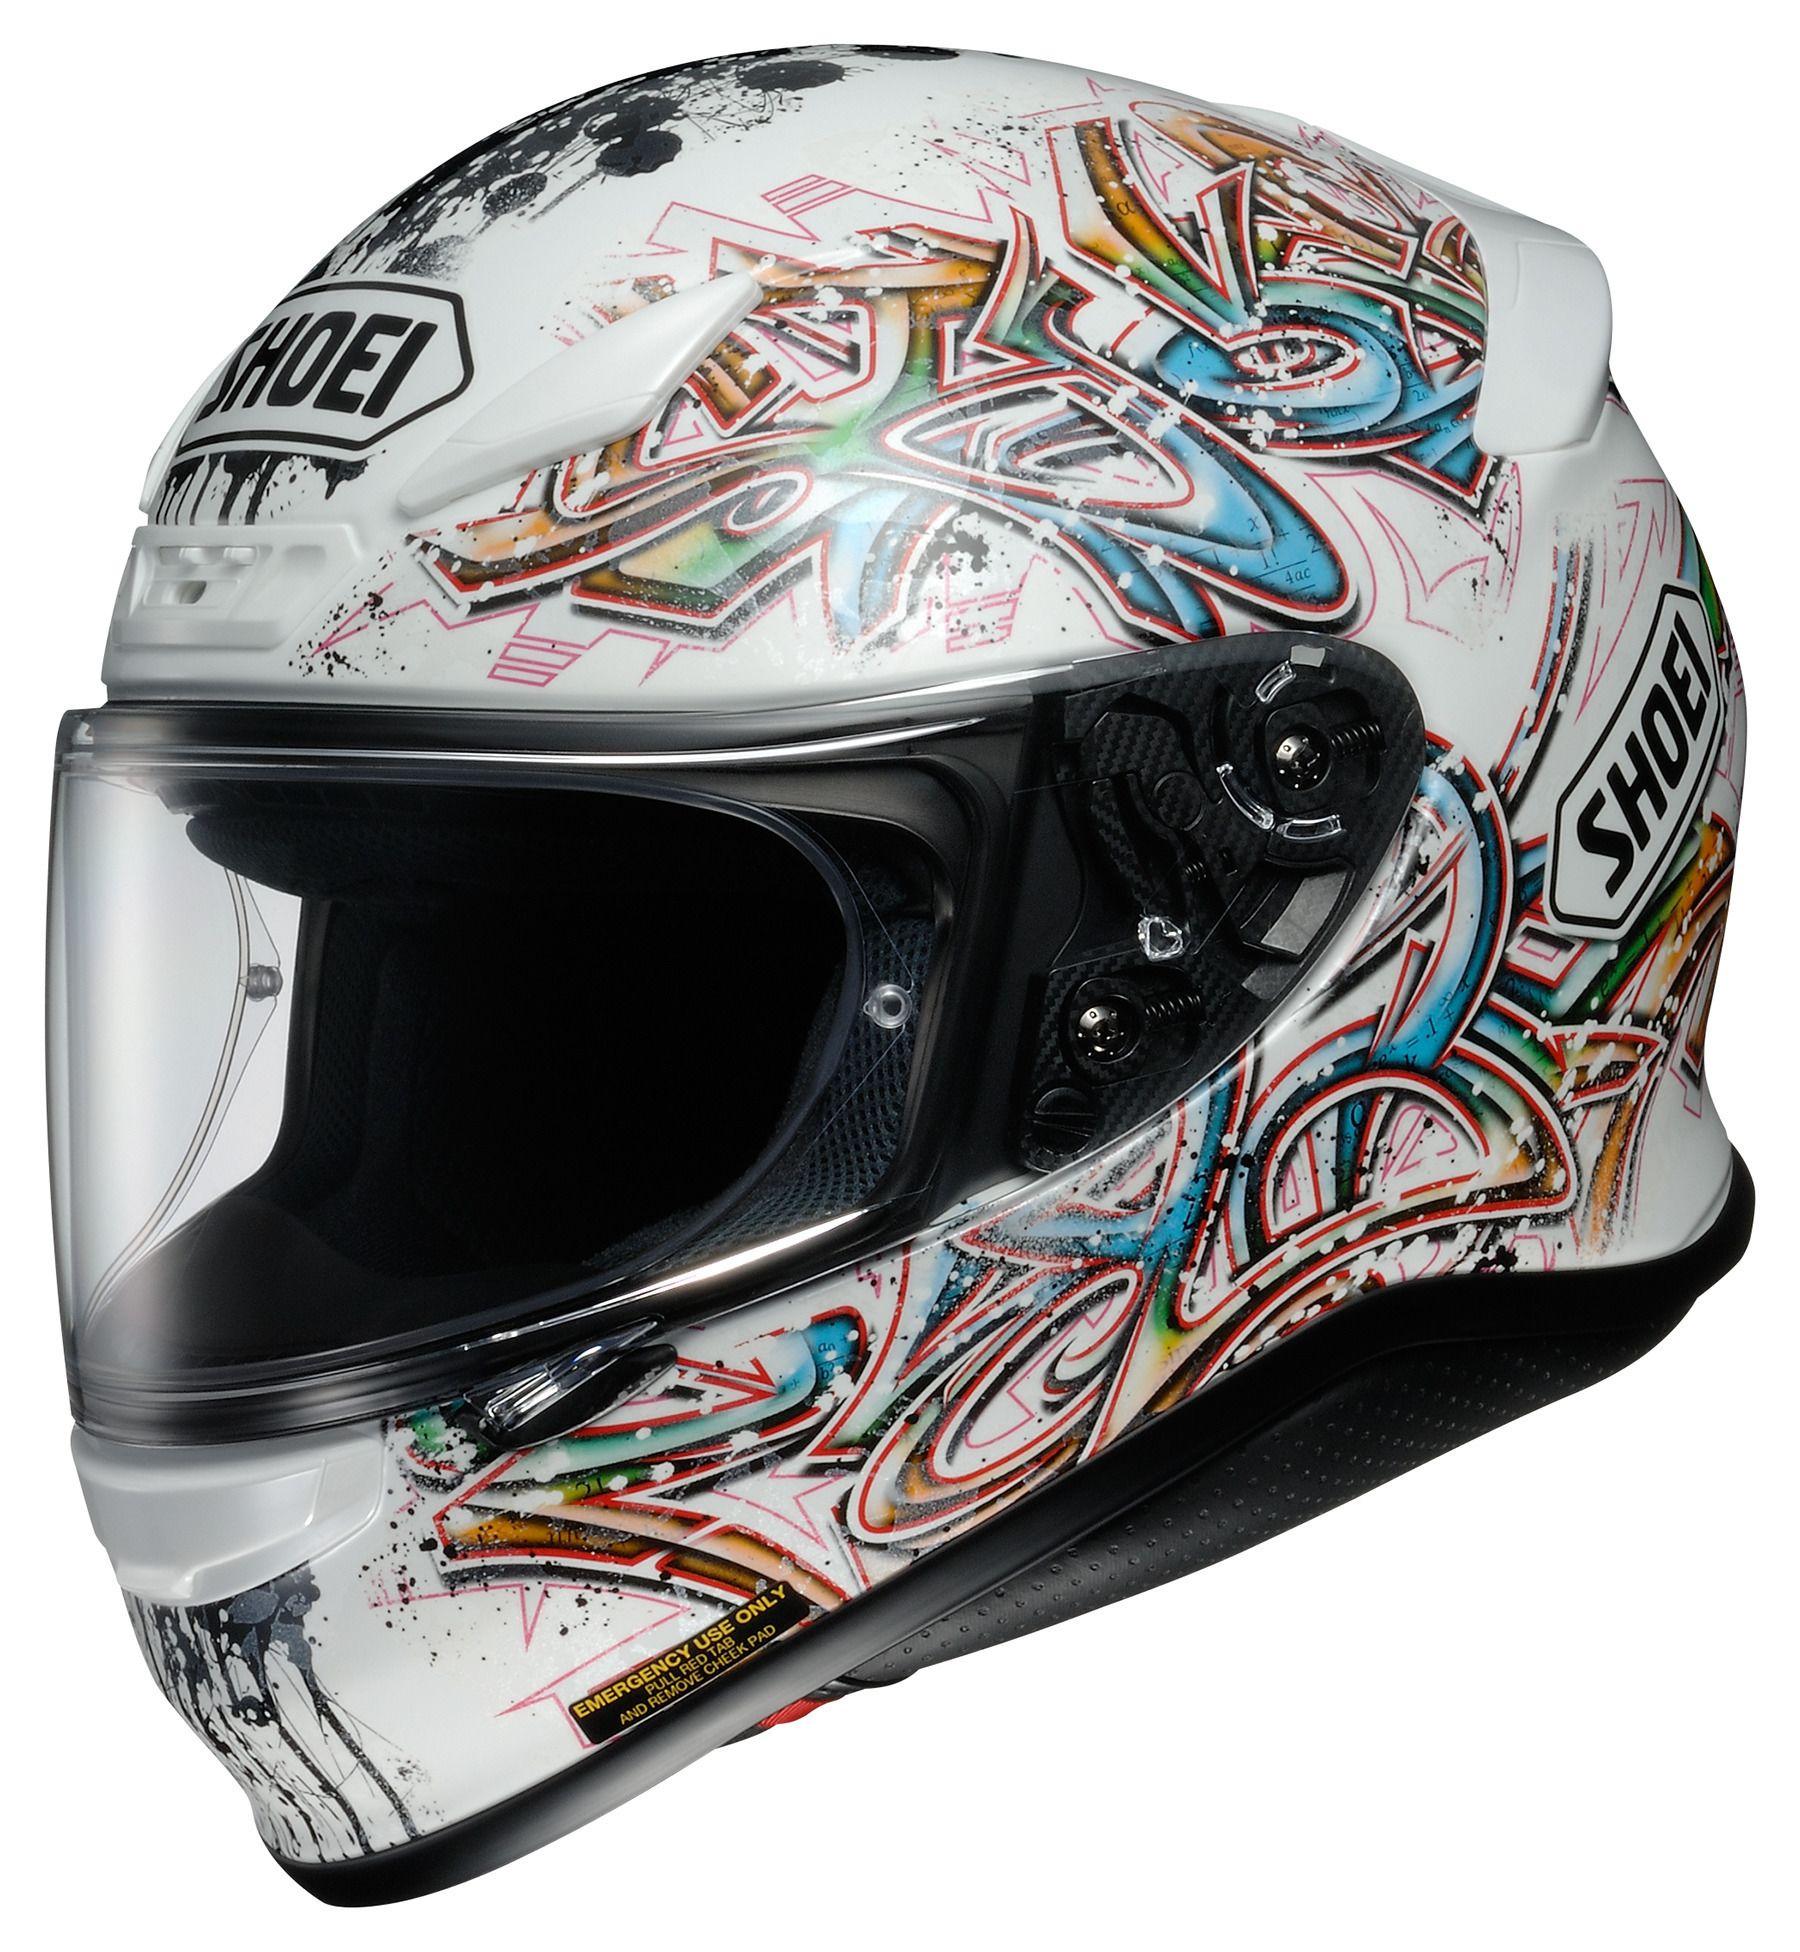 Shoei Rf 1200 Graffiti Helmet 24 94 91 Off Revzilla